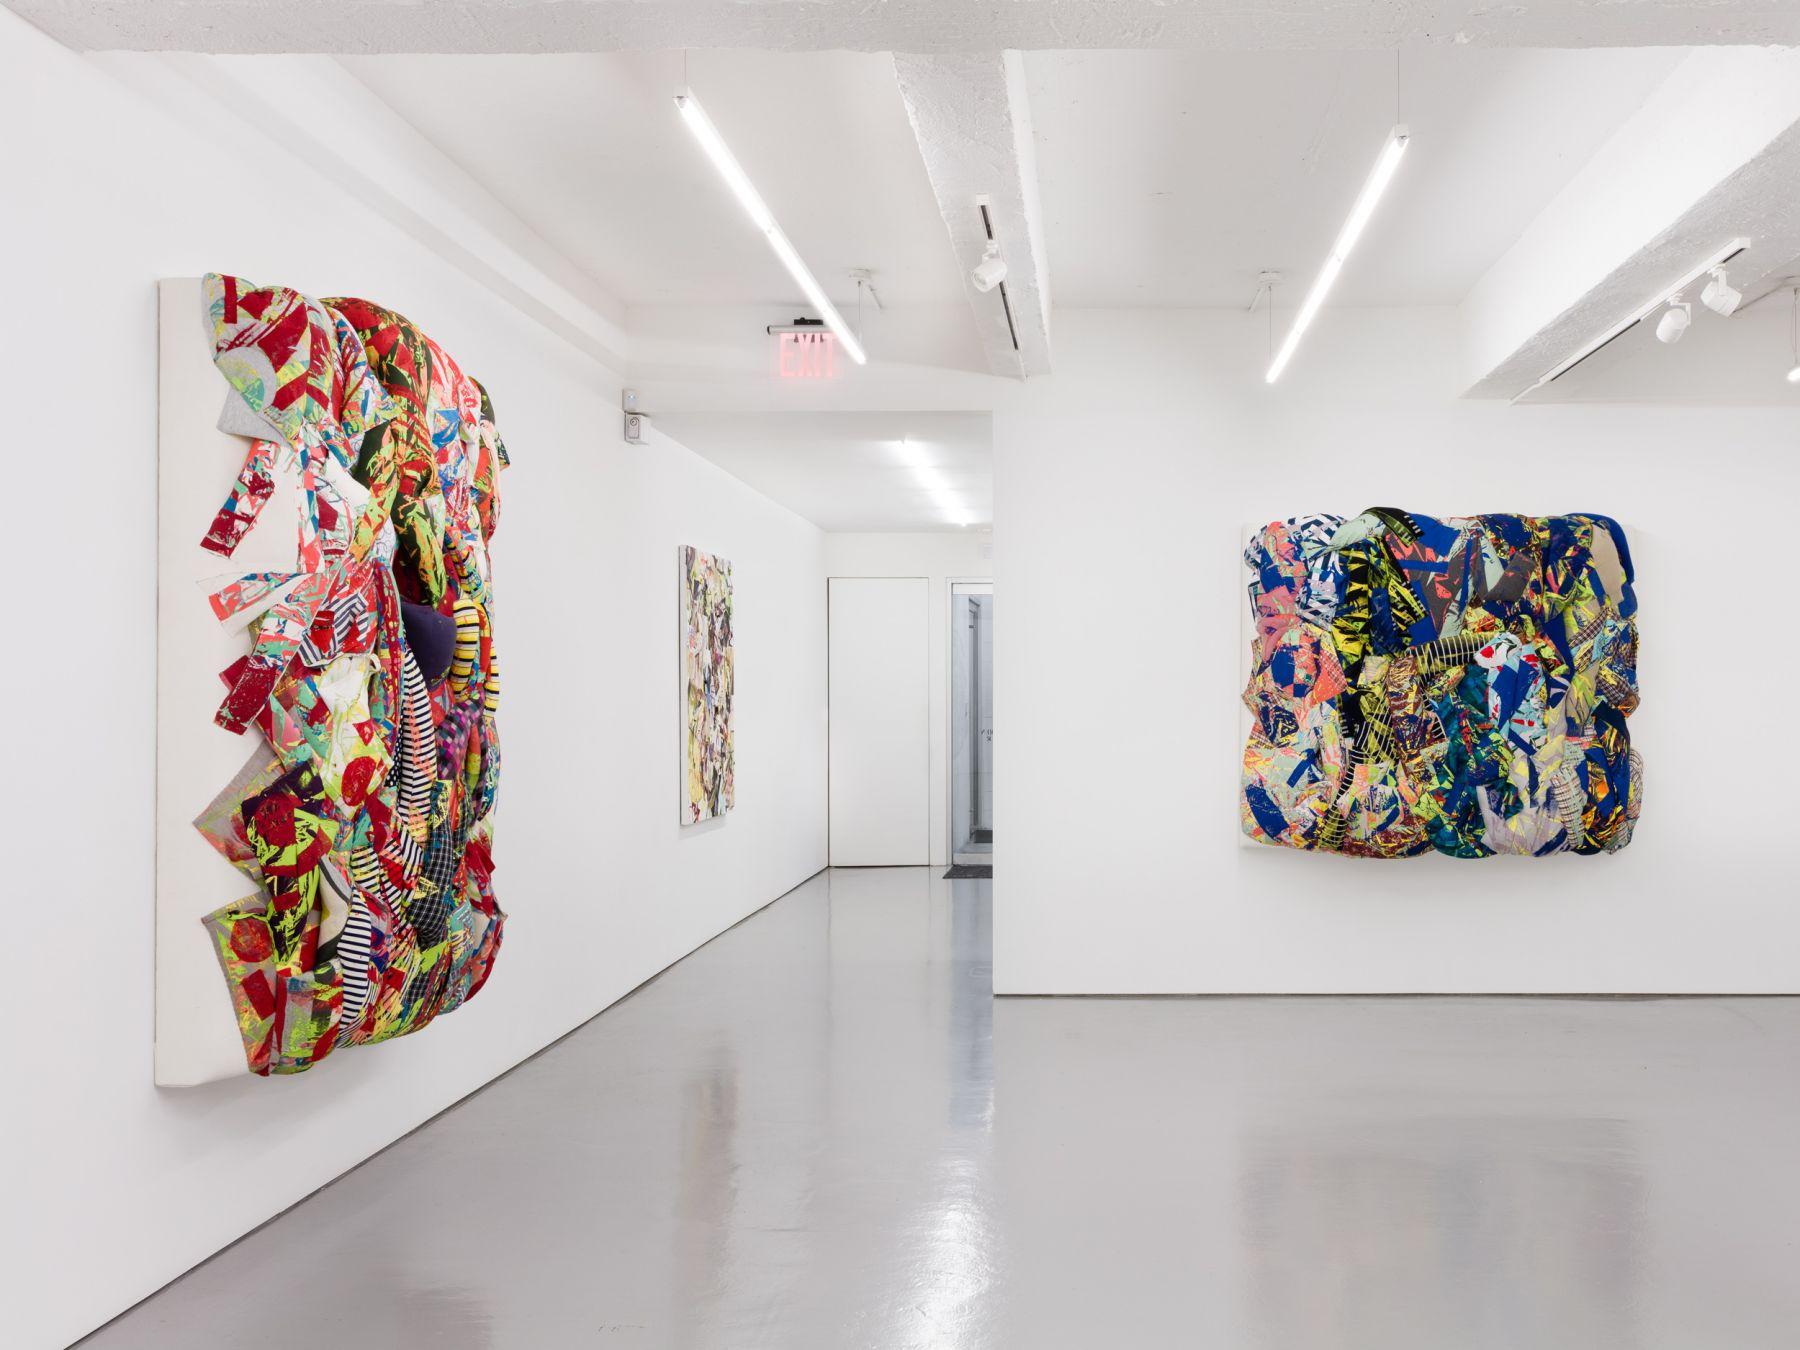 Gallery installation view, 2018